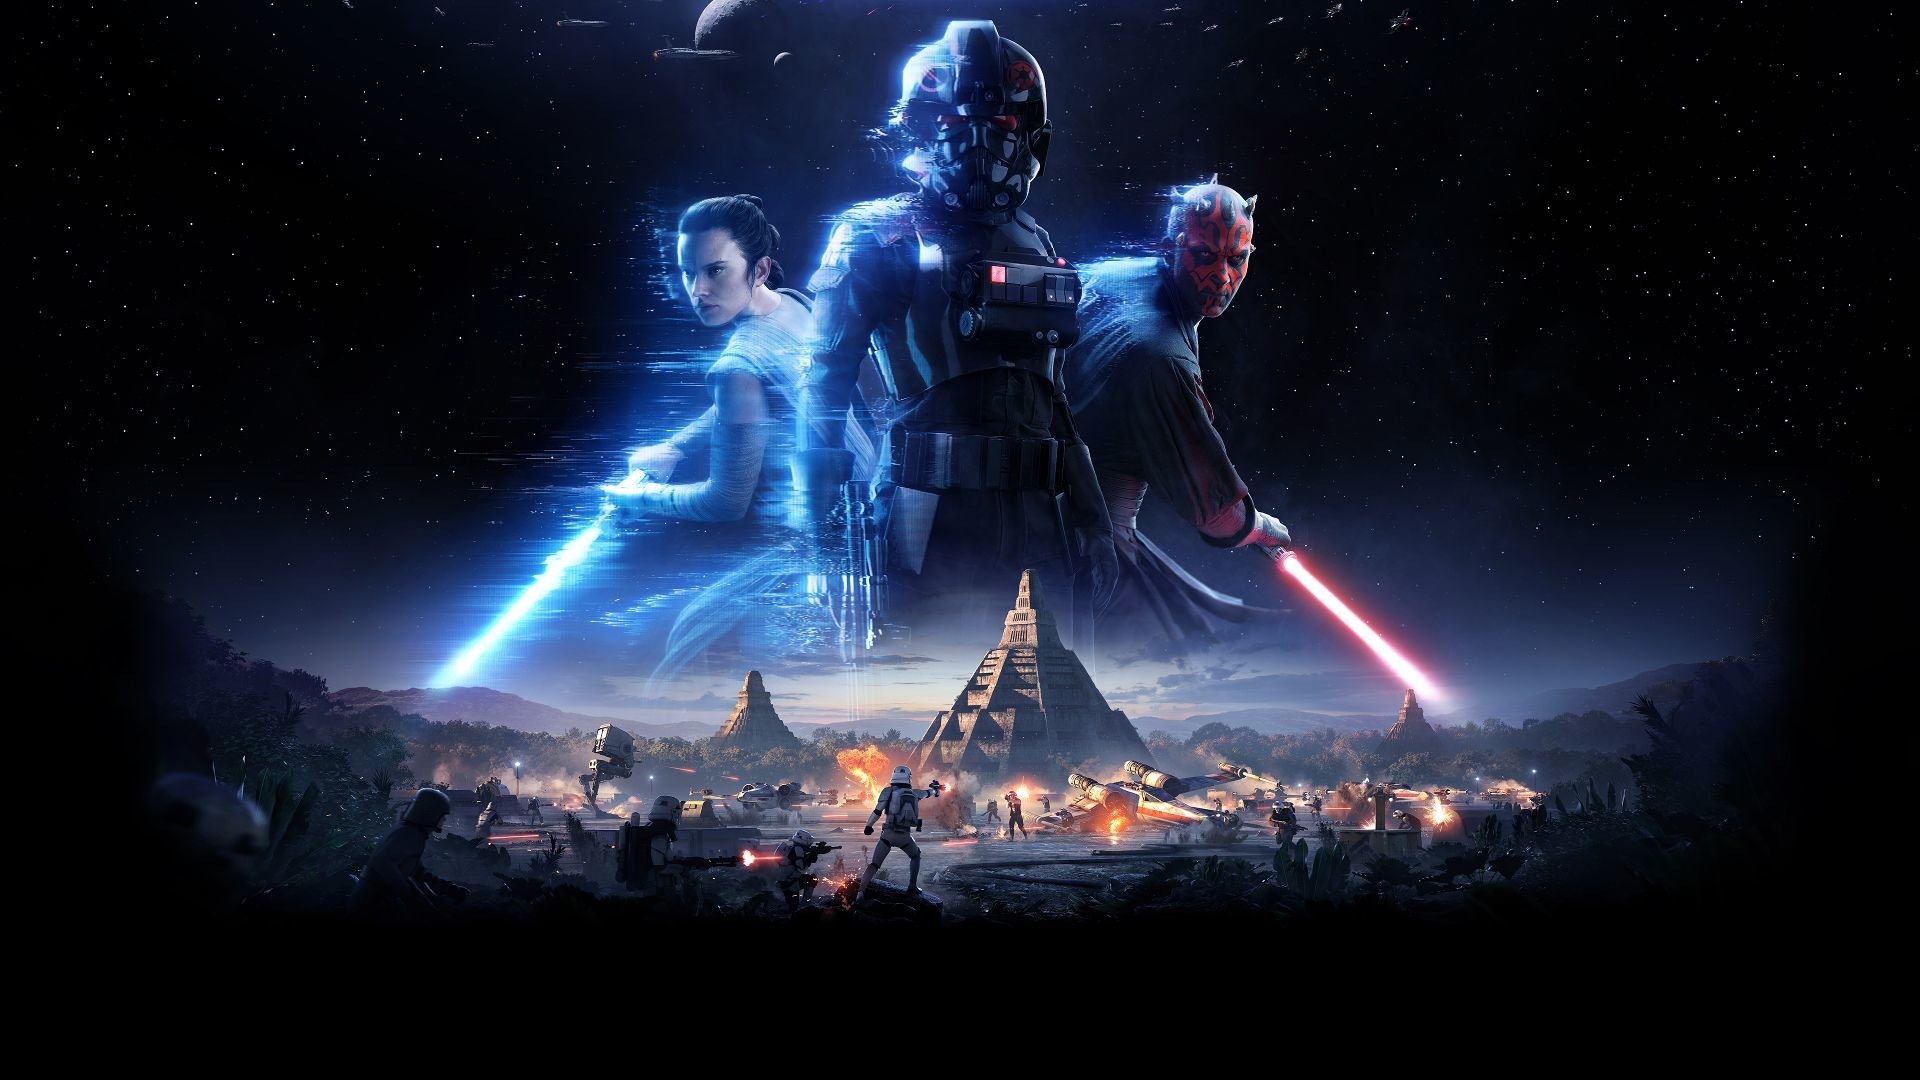 Video Game – Star Wars Battlefront II (2017) Star Wars Sci Fi Futuristic  Imperial